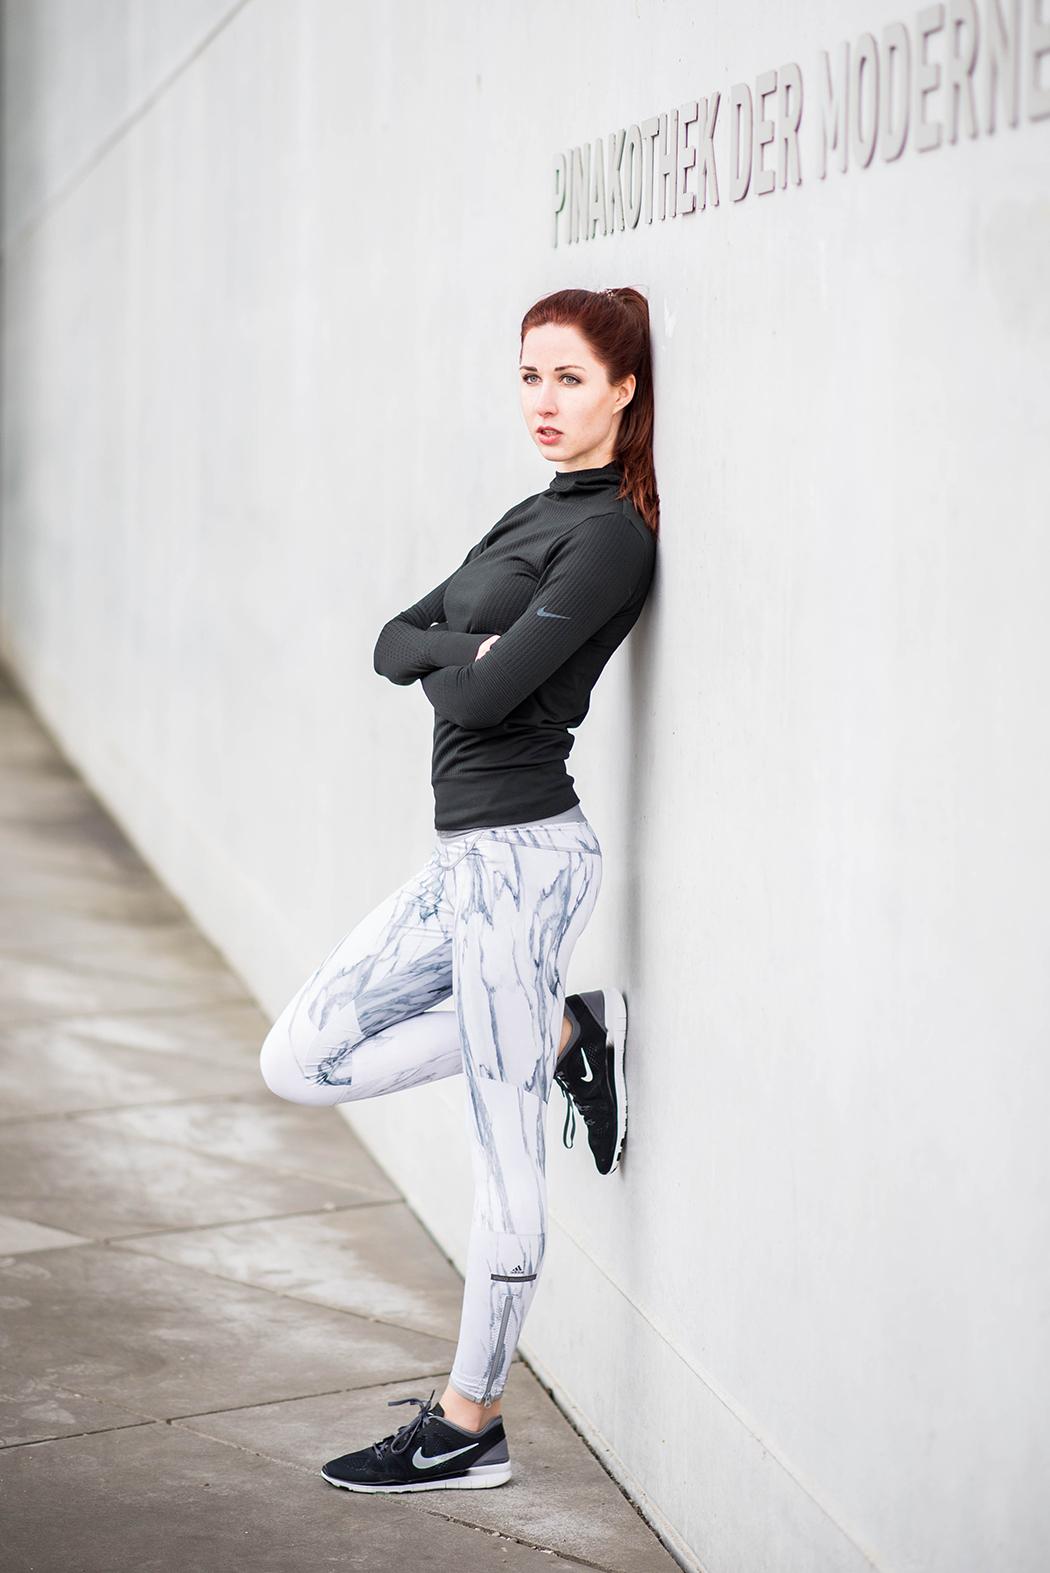 StellaMcCartney-Adidas-Fitness-Fitnessblogger-Deutschland-München-Lindarella-Sportblog-Trainingsplan-Engelhorn-2-web